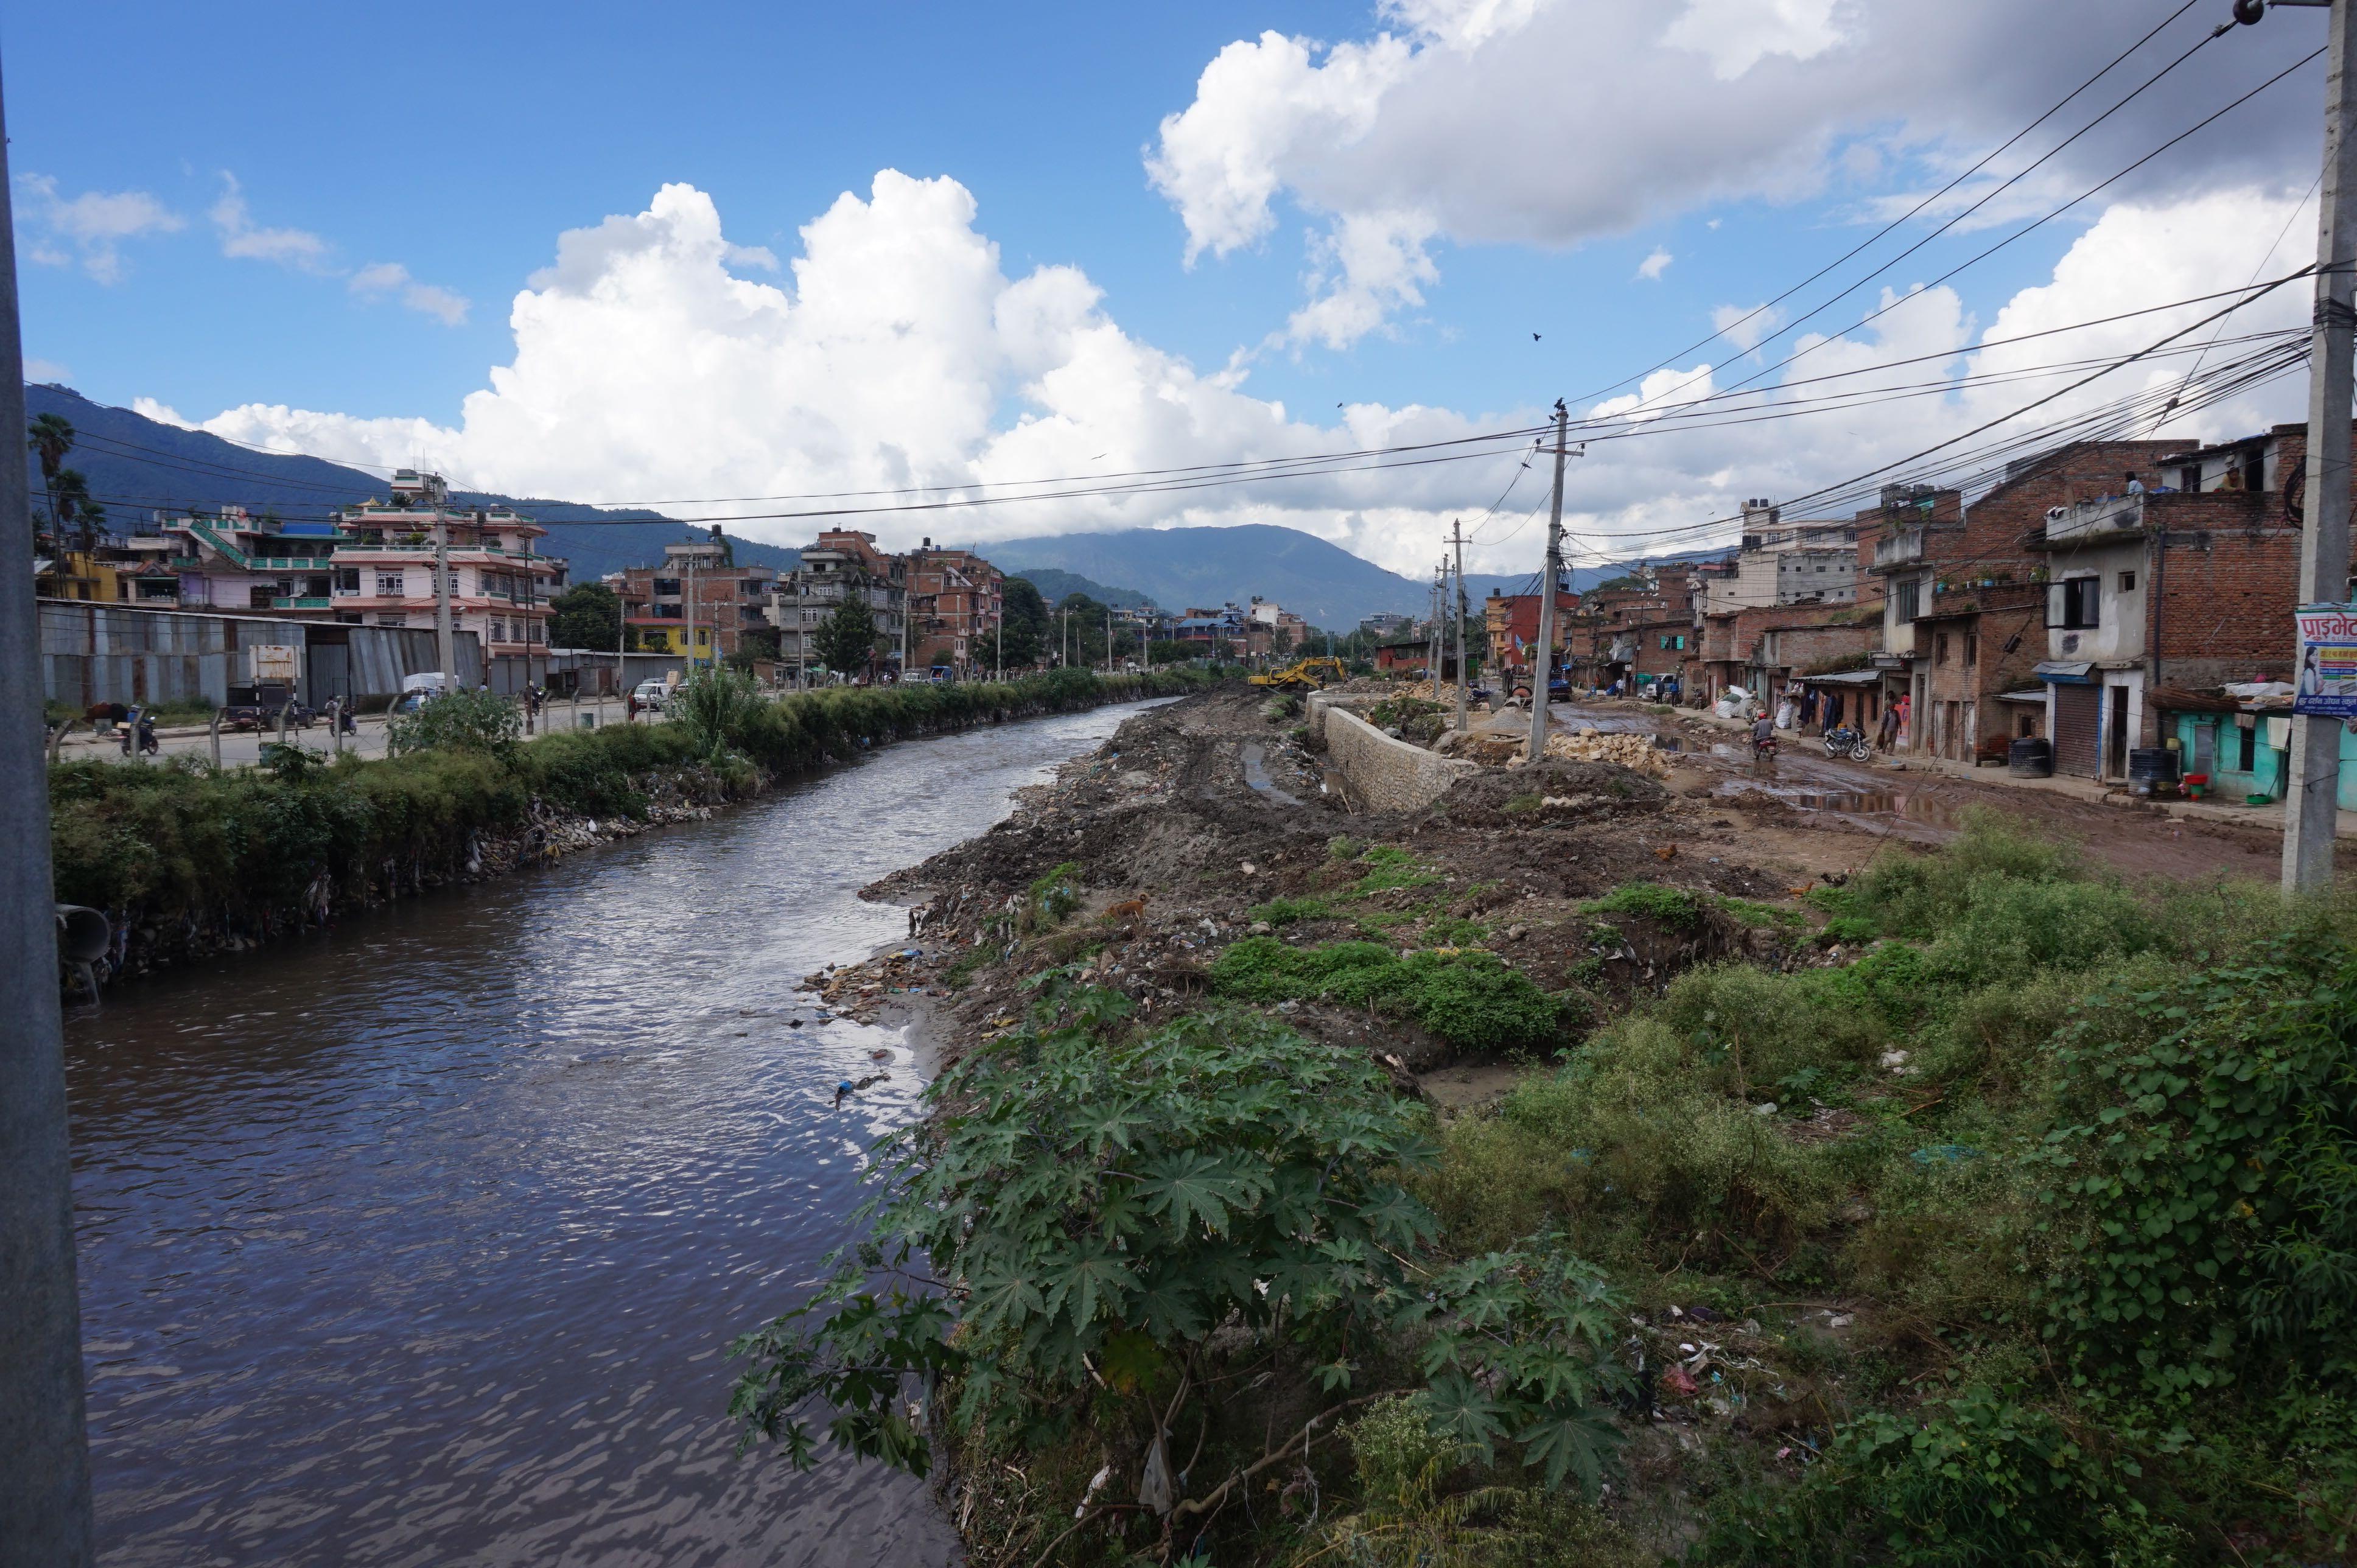 River in Kathmandu